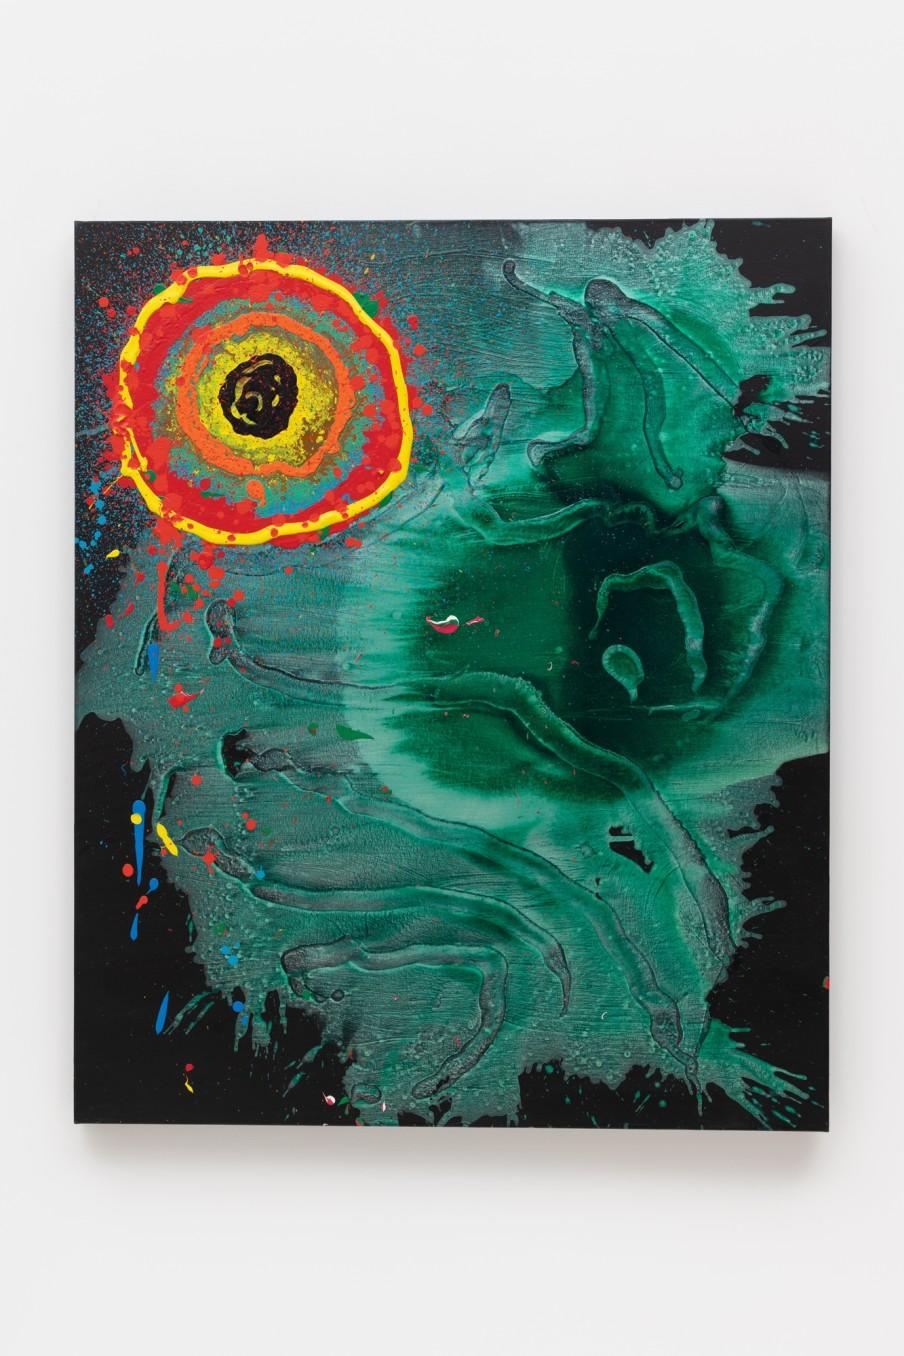 John Hoyland Enchanted Land 30.12.06, 2006 Acrylic on canvas 152.9 x 127 cm 60 1/4 x 50 in